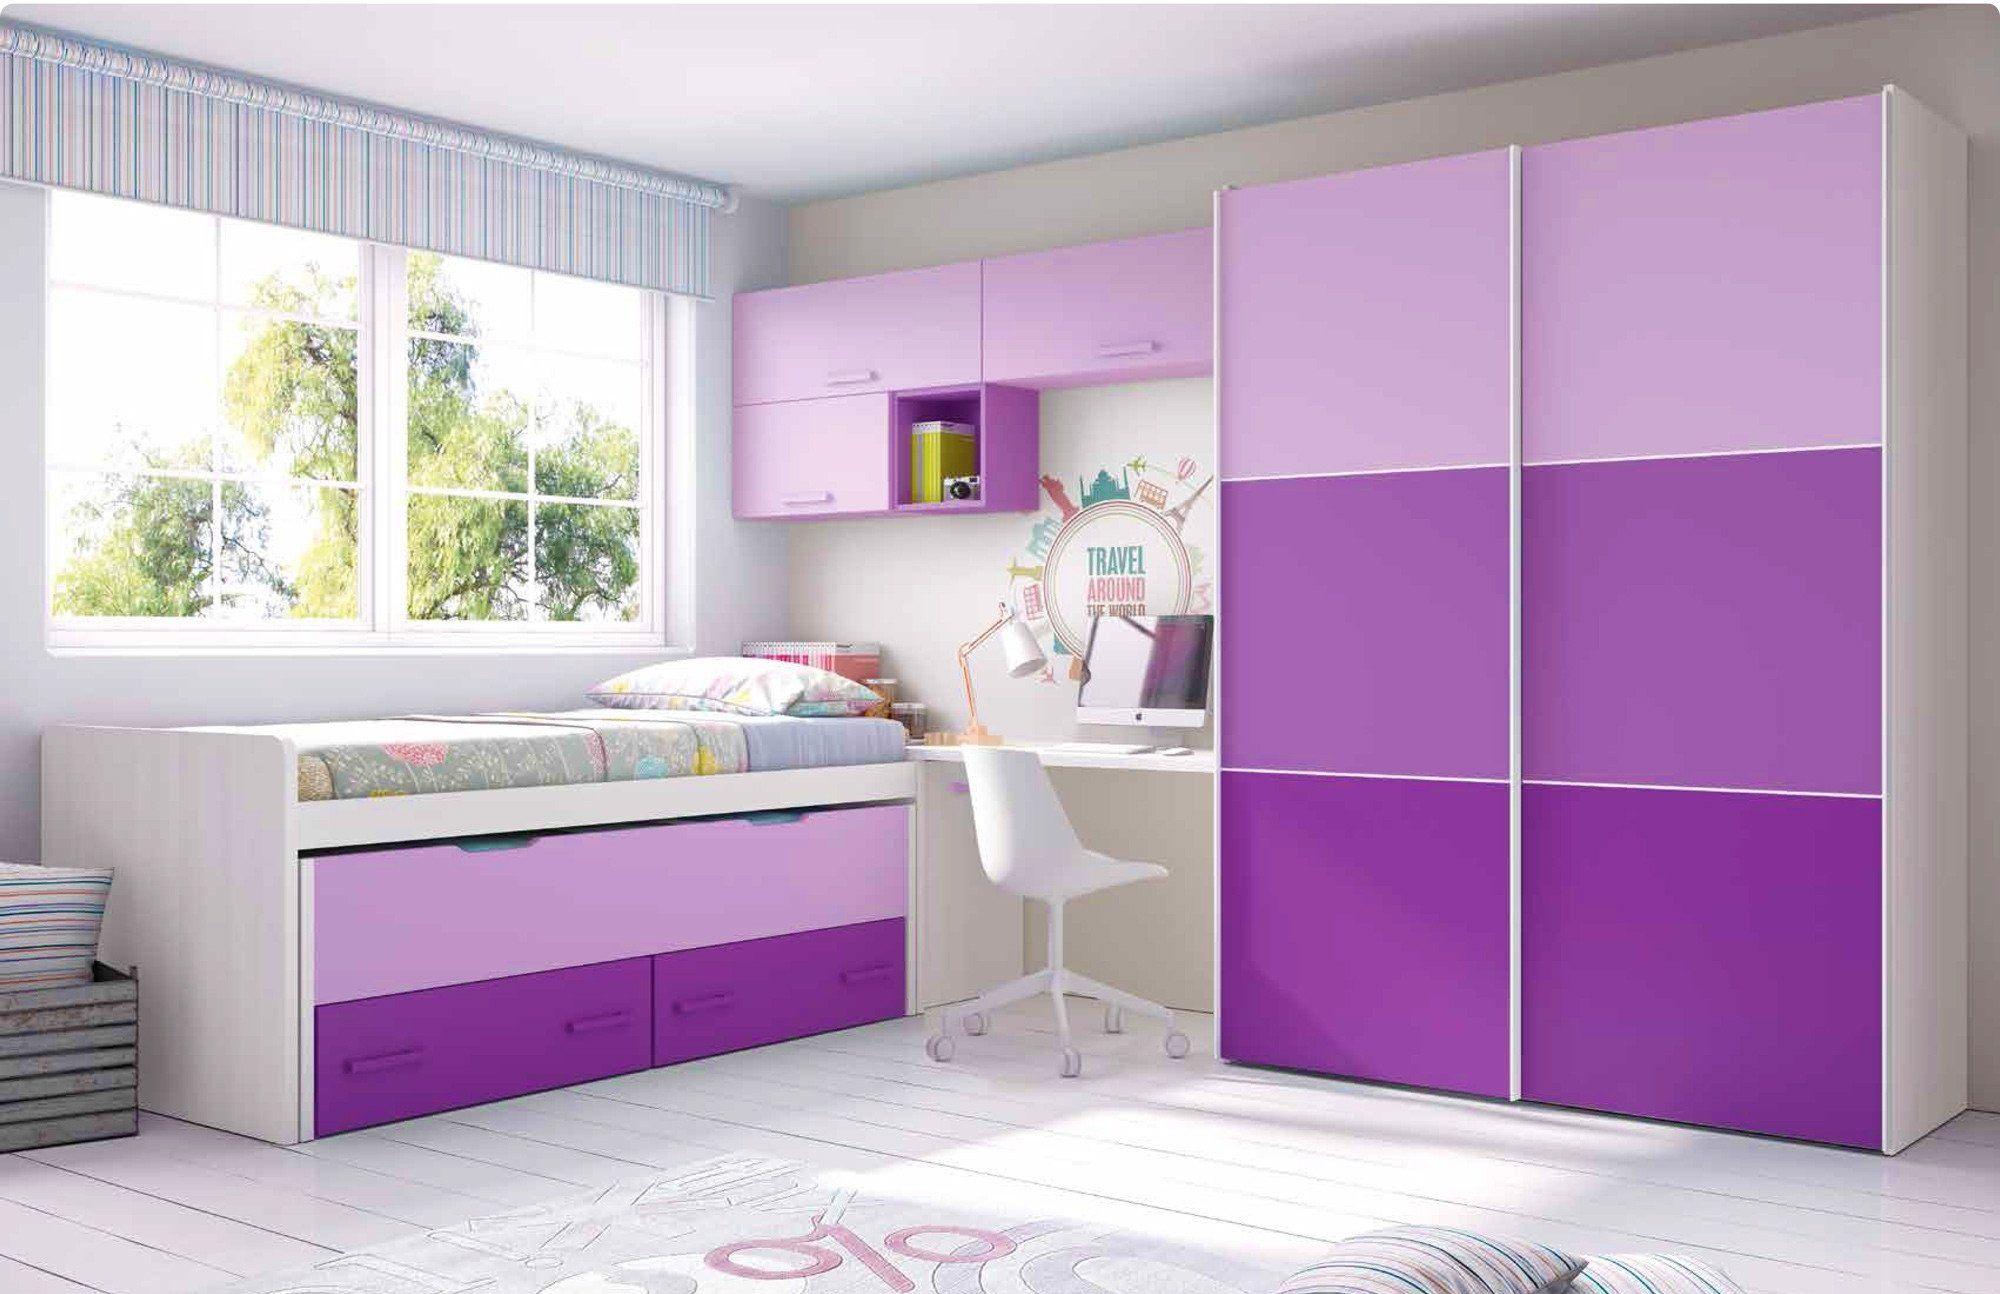 Lit 2 Places Ado Bel Divin Chambre Ado Mezzanine Et Lit Mezzanine Design Lit Mezzanine